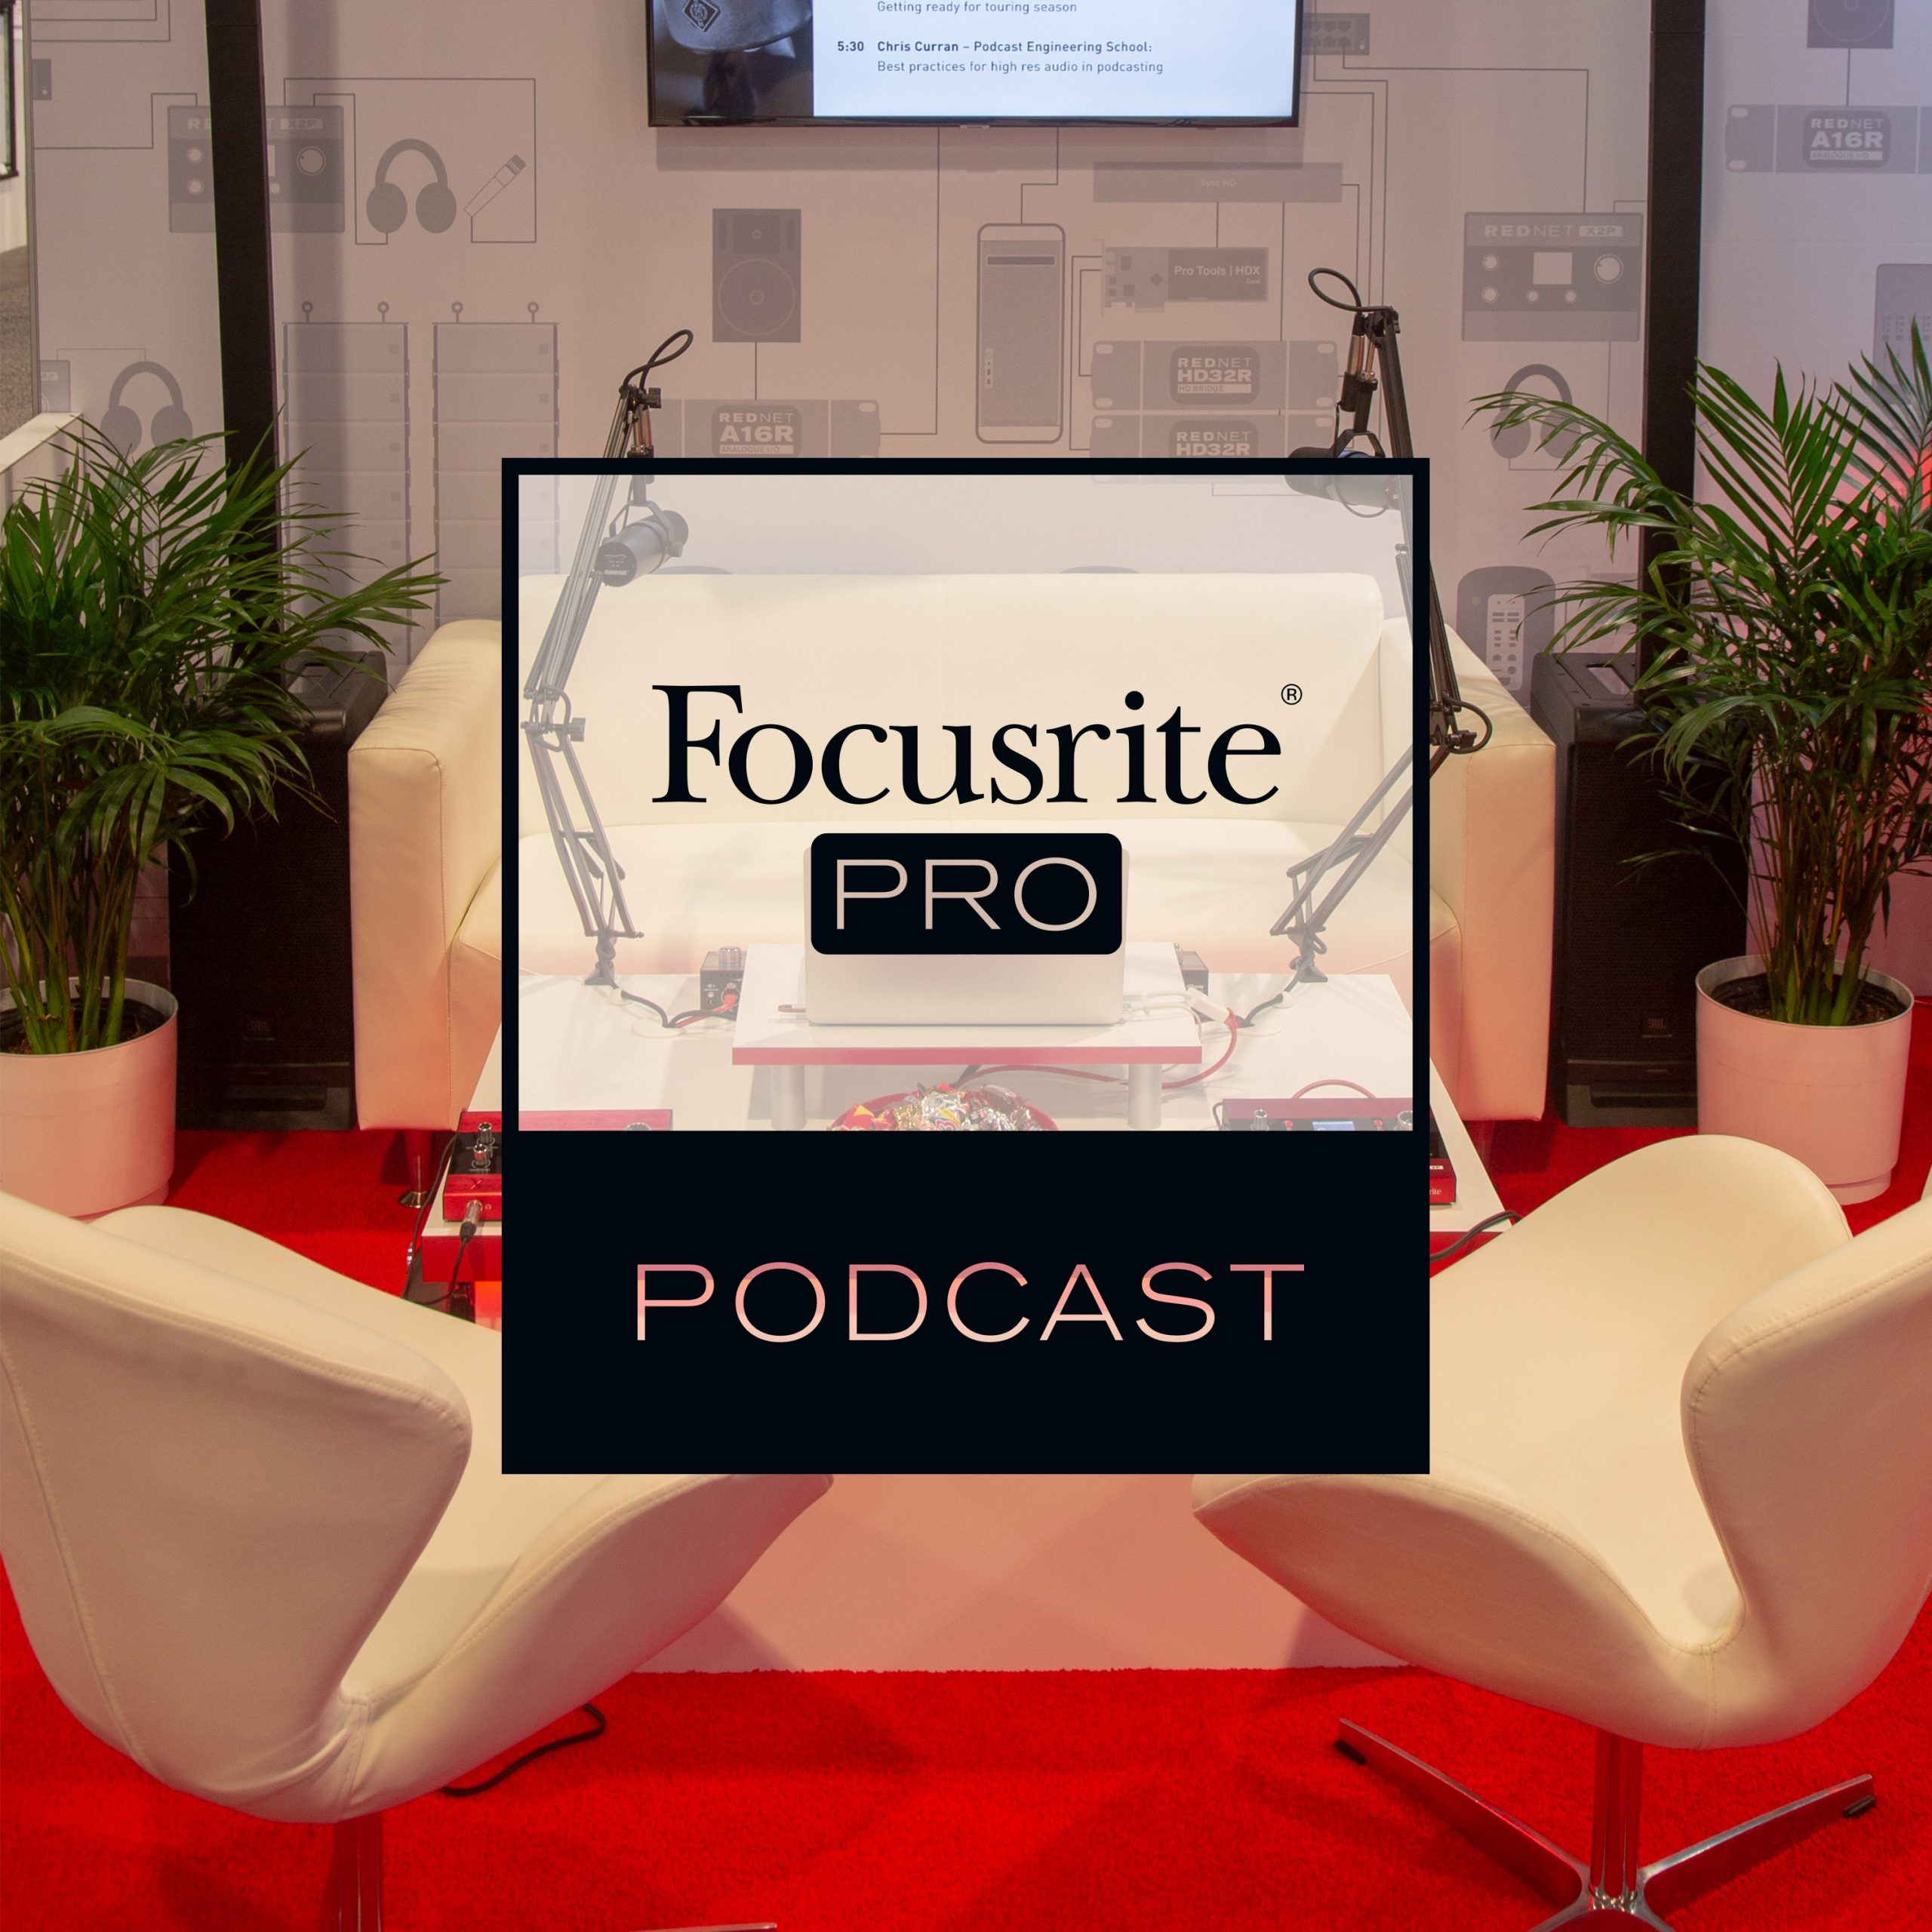 Focusrite Pro Podcast